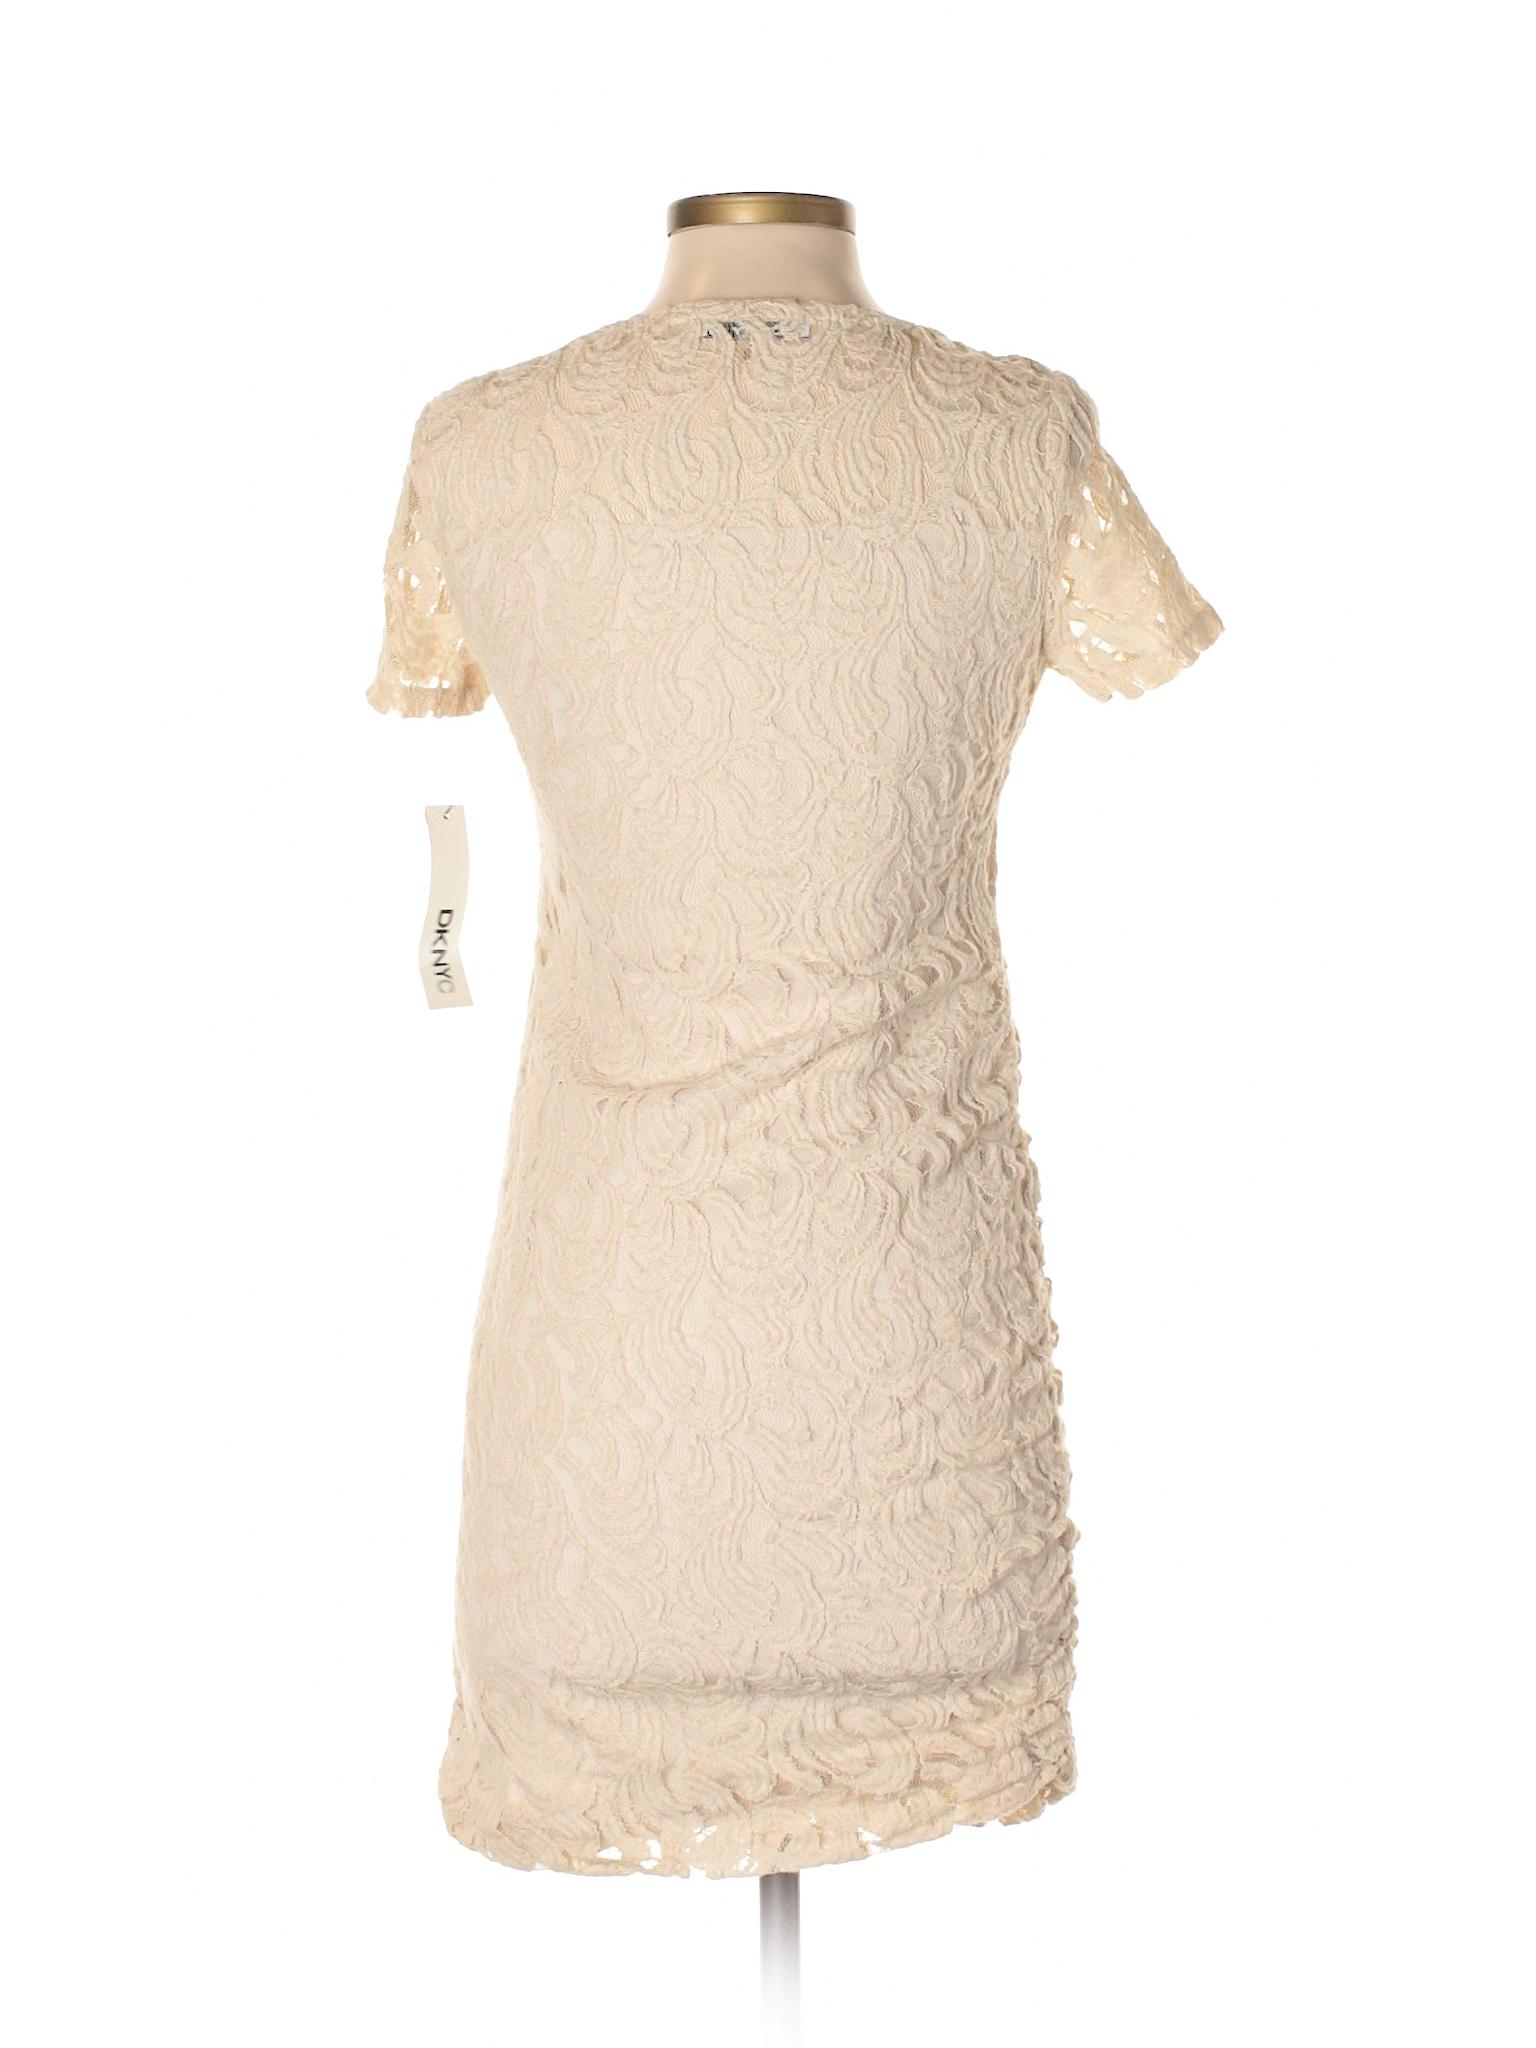 Selling DKNYC Dress Selling DKNYC Casual Casual Dress Selling wqxXtg0ST